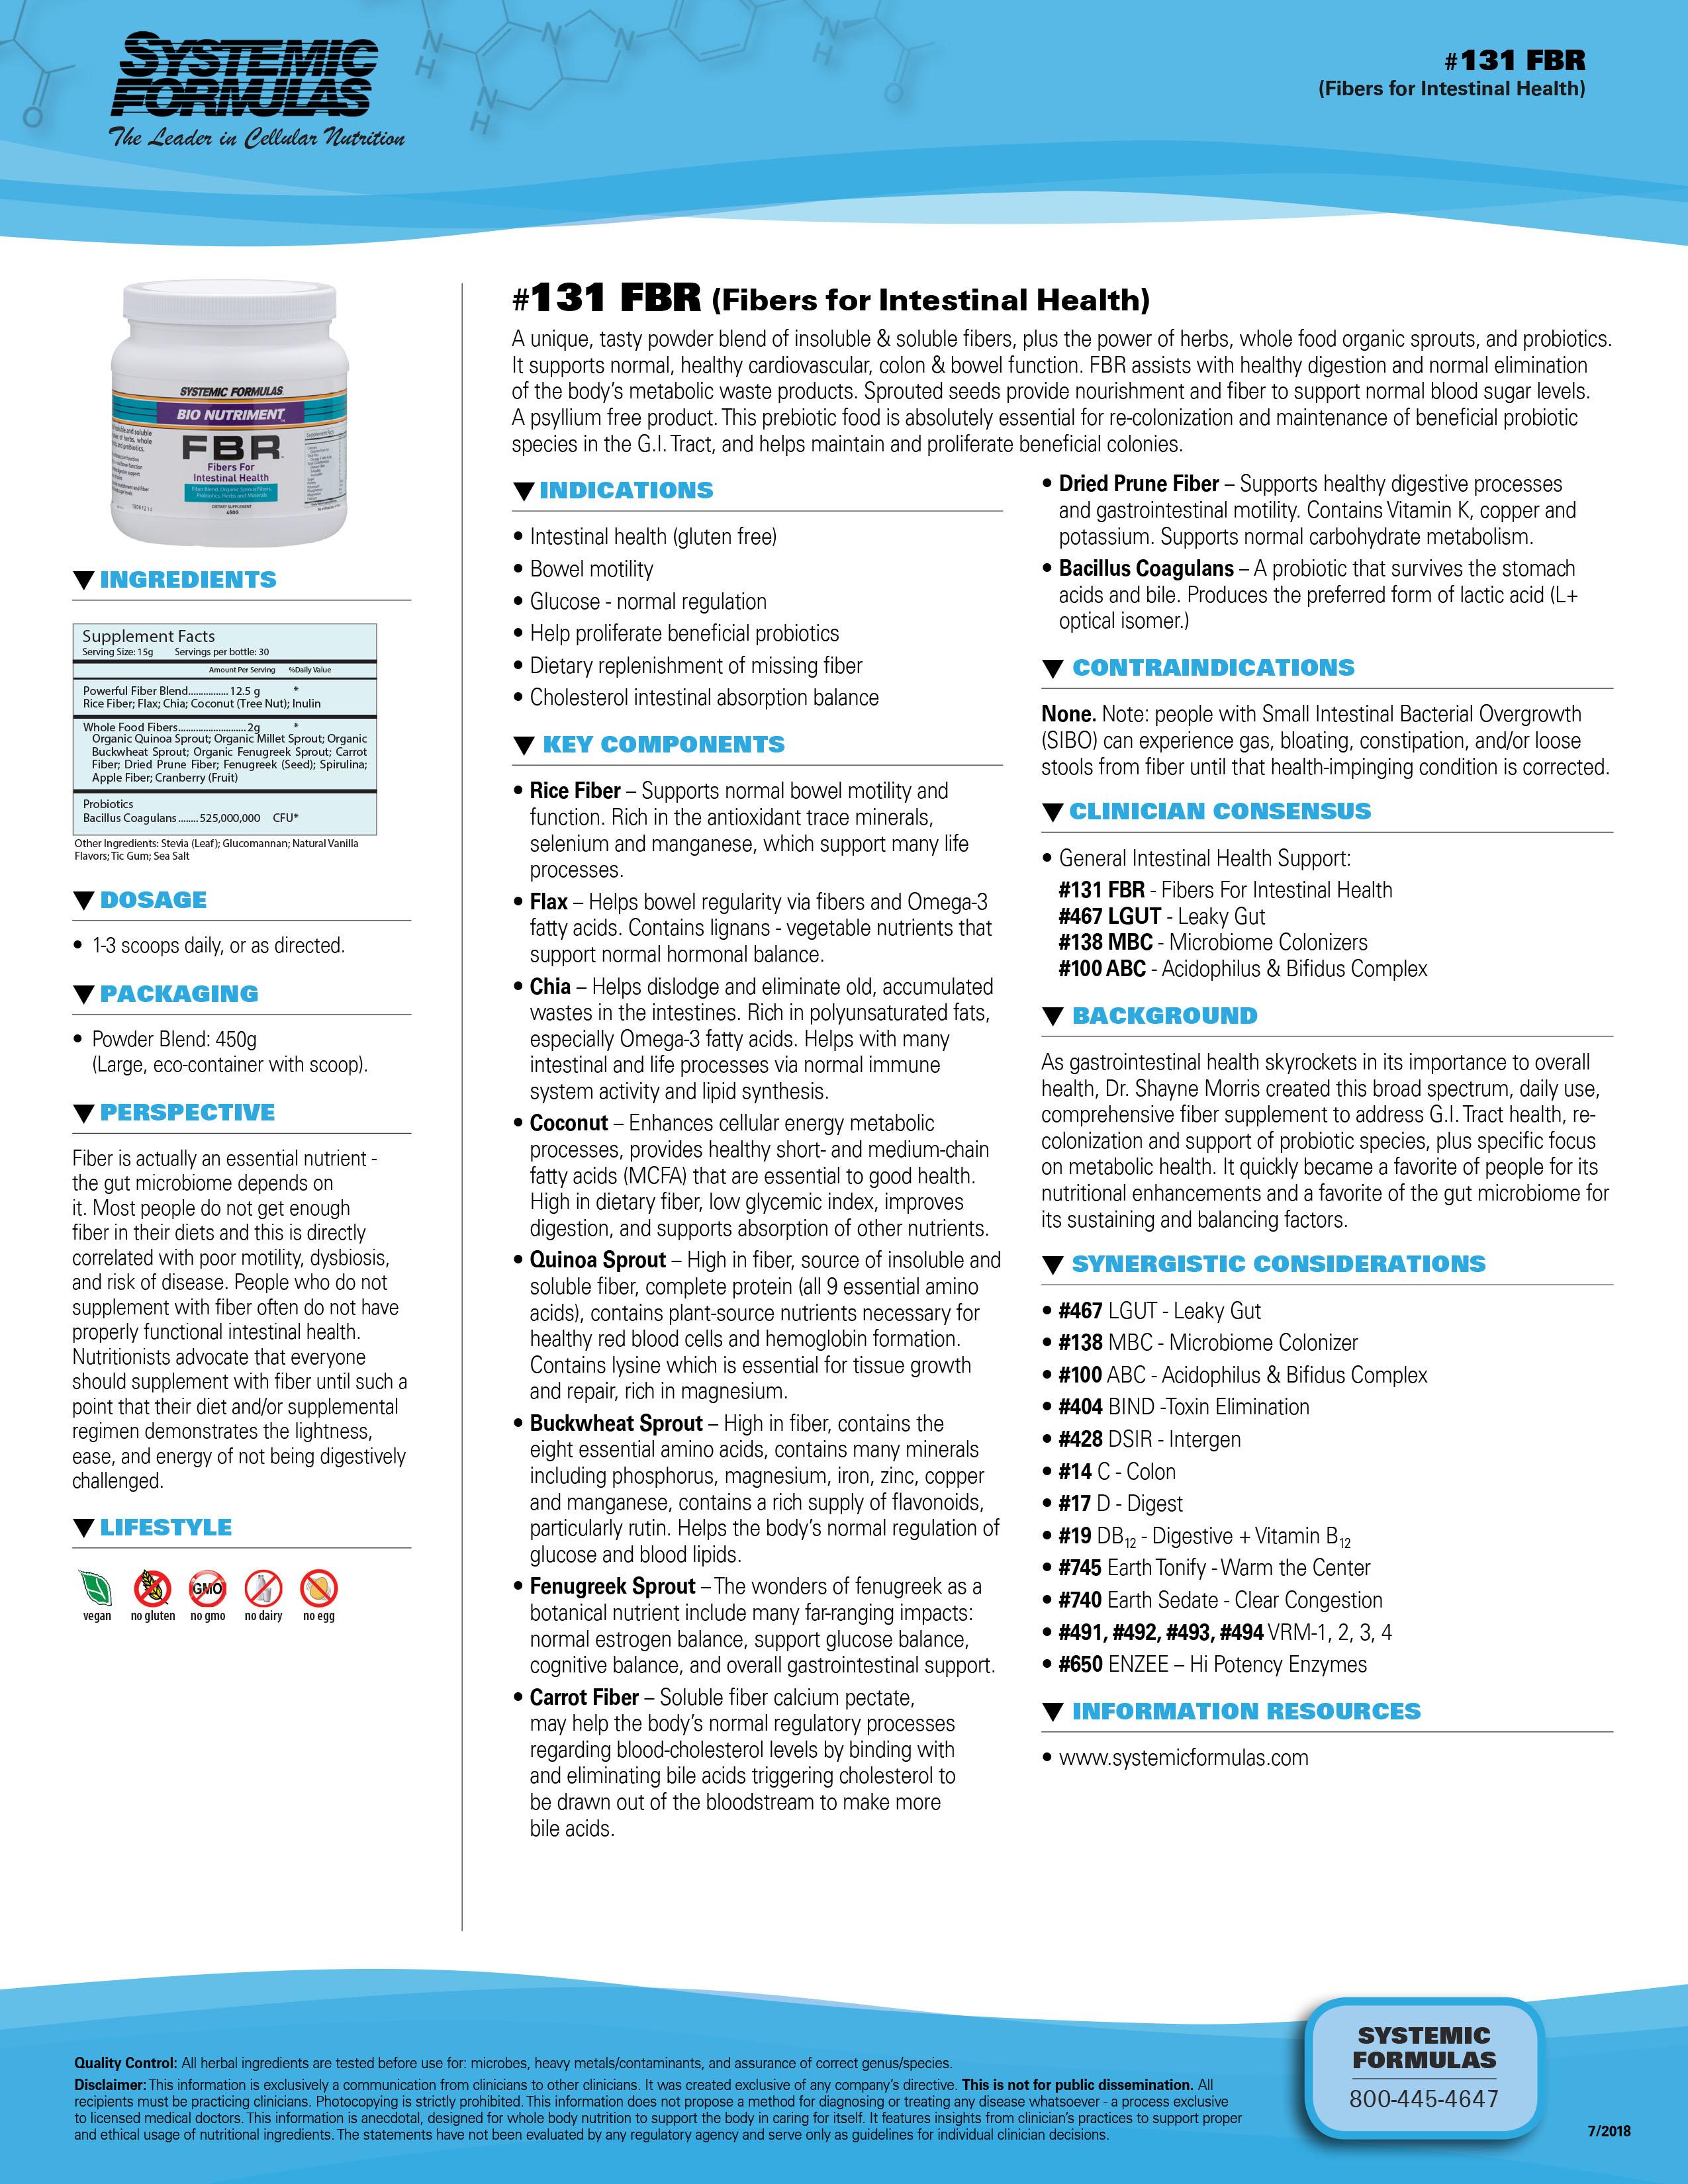 #131 FBR (Fibers for Intestinal Health)